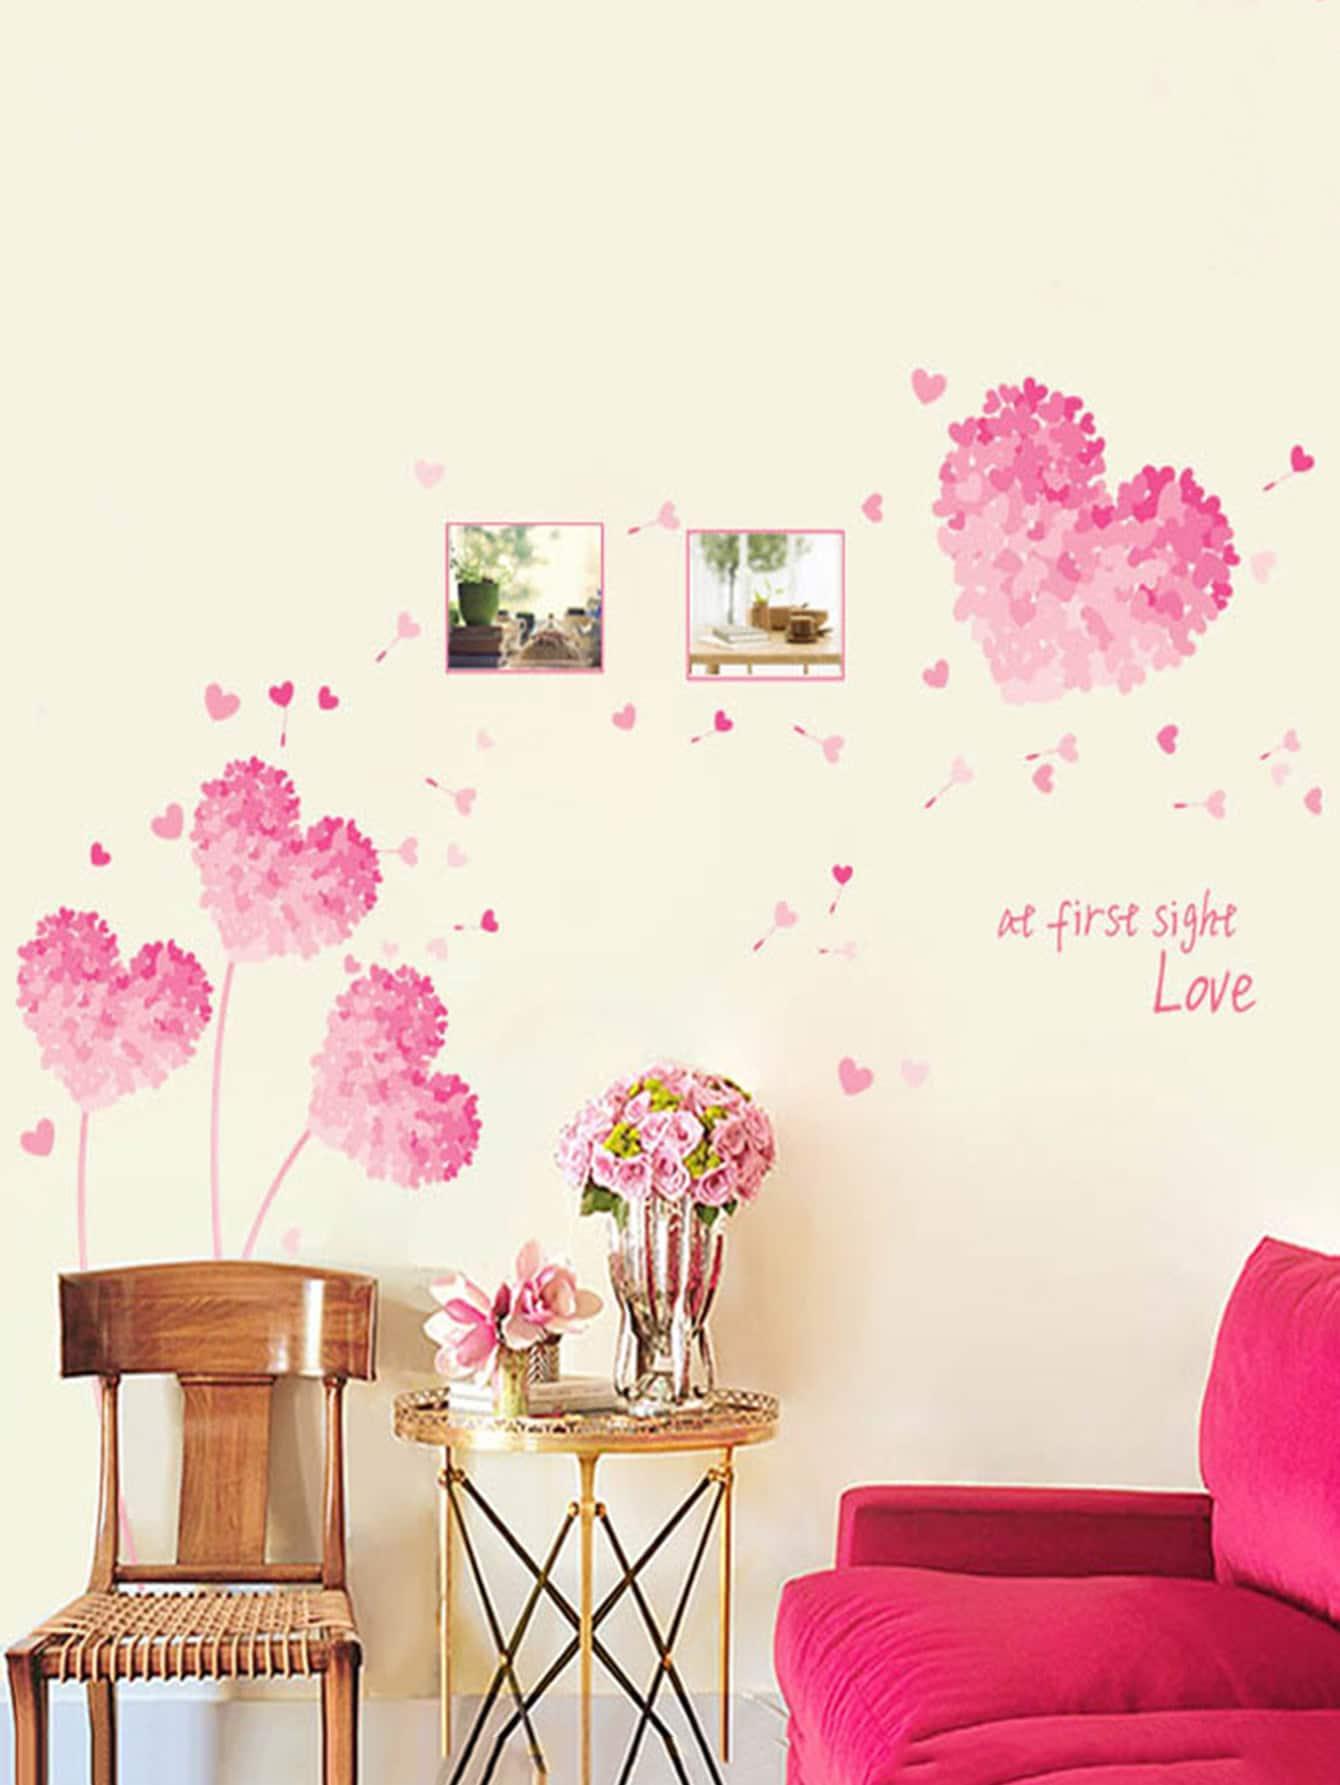 Pastel Heart Wall Decal pastel heart wall decal